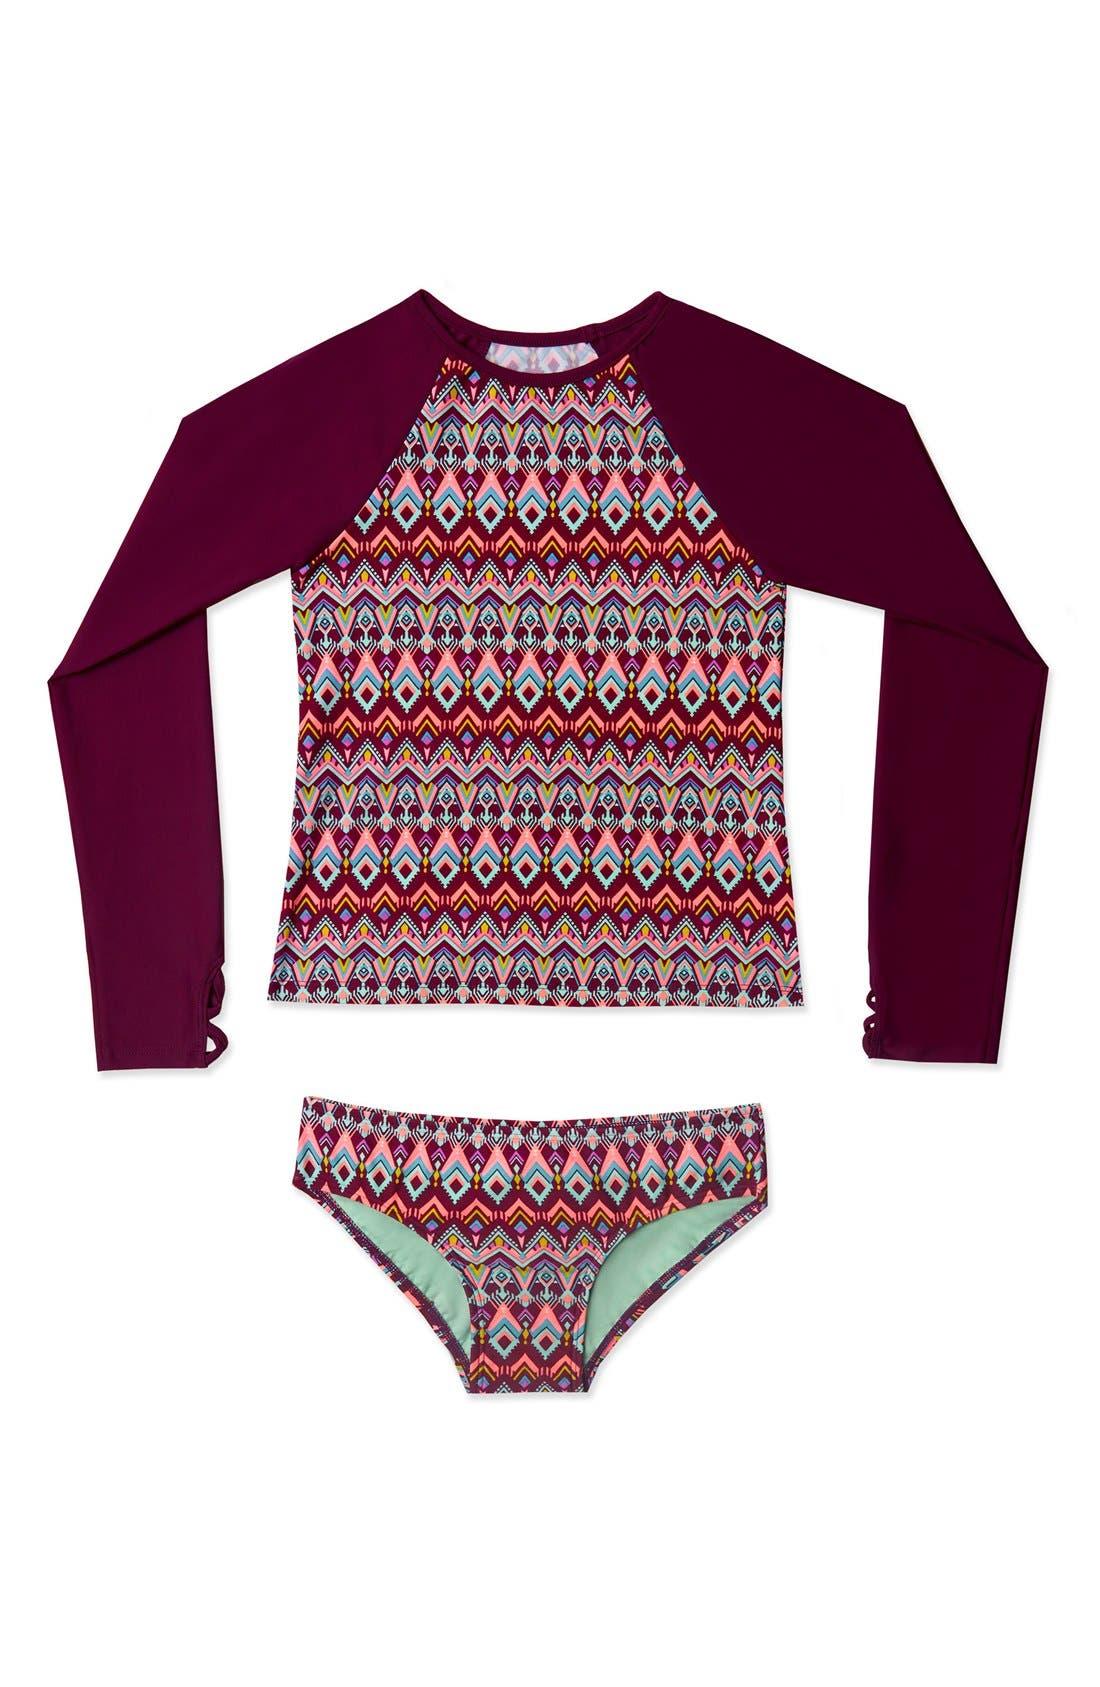 Gossip Girl Deco Diamond Print Two-Piece Rashguard Swimsuit (Big Girls)